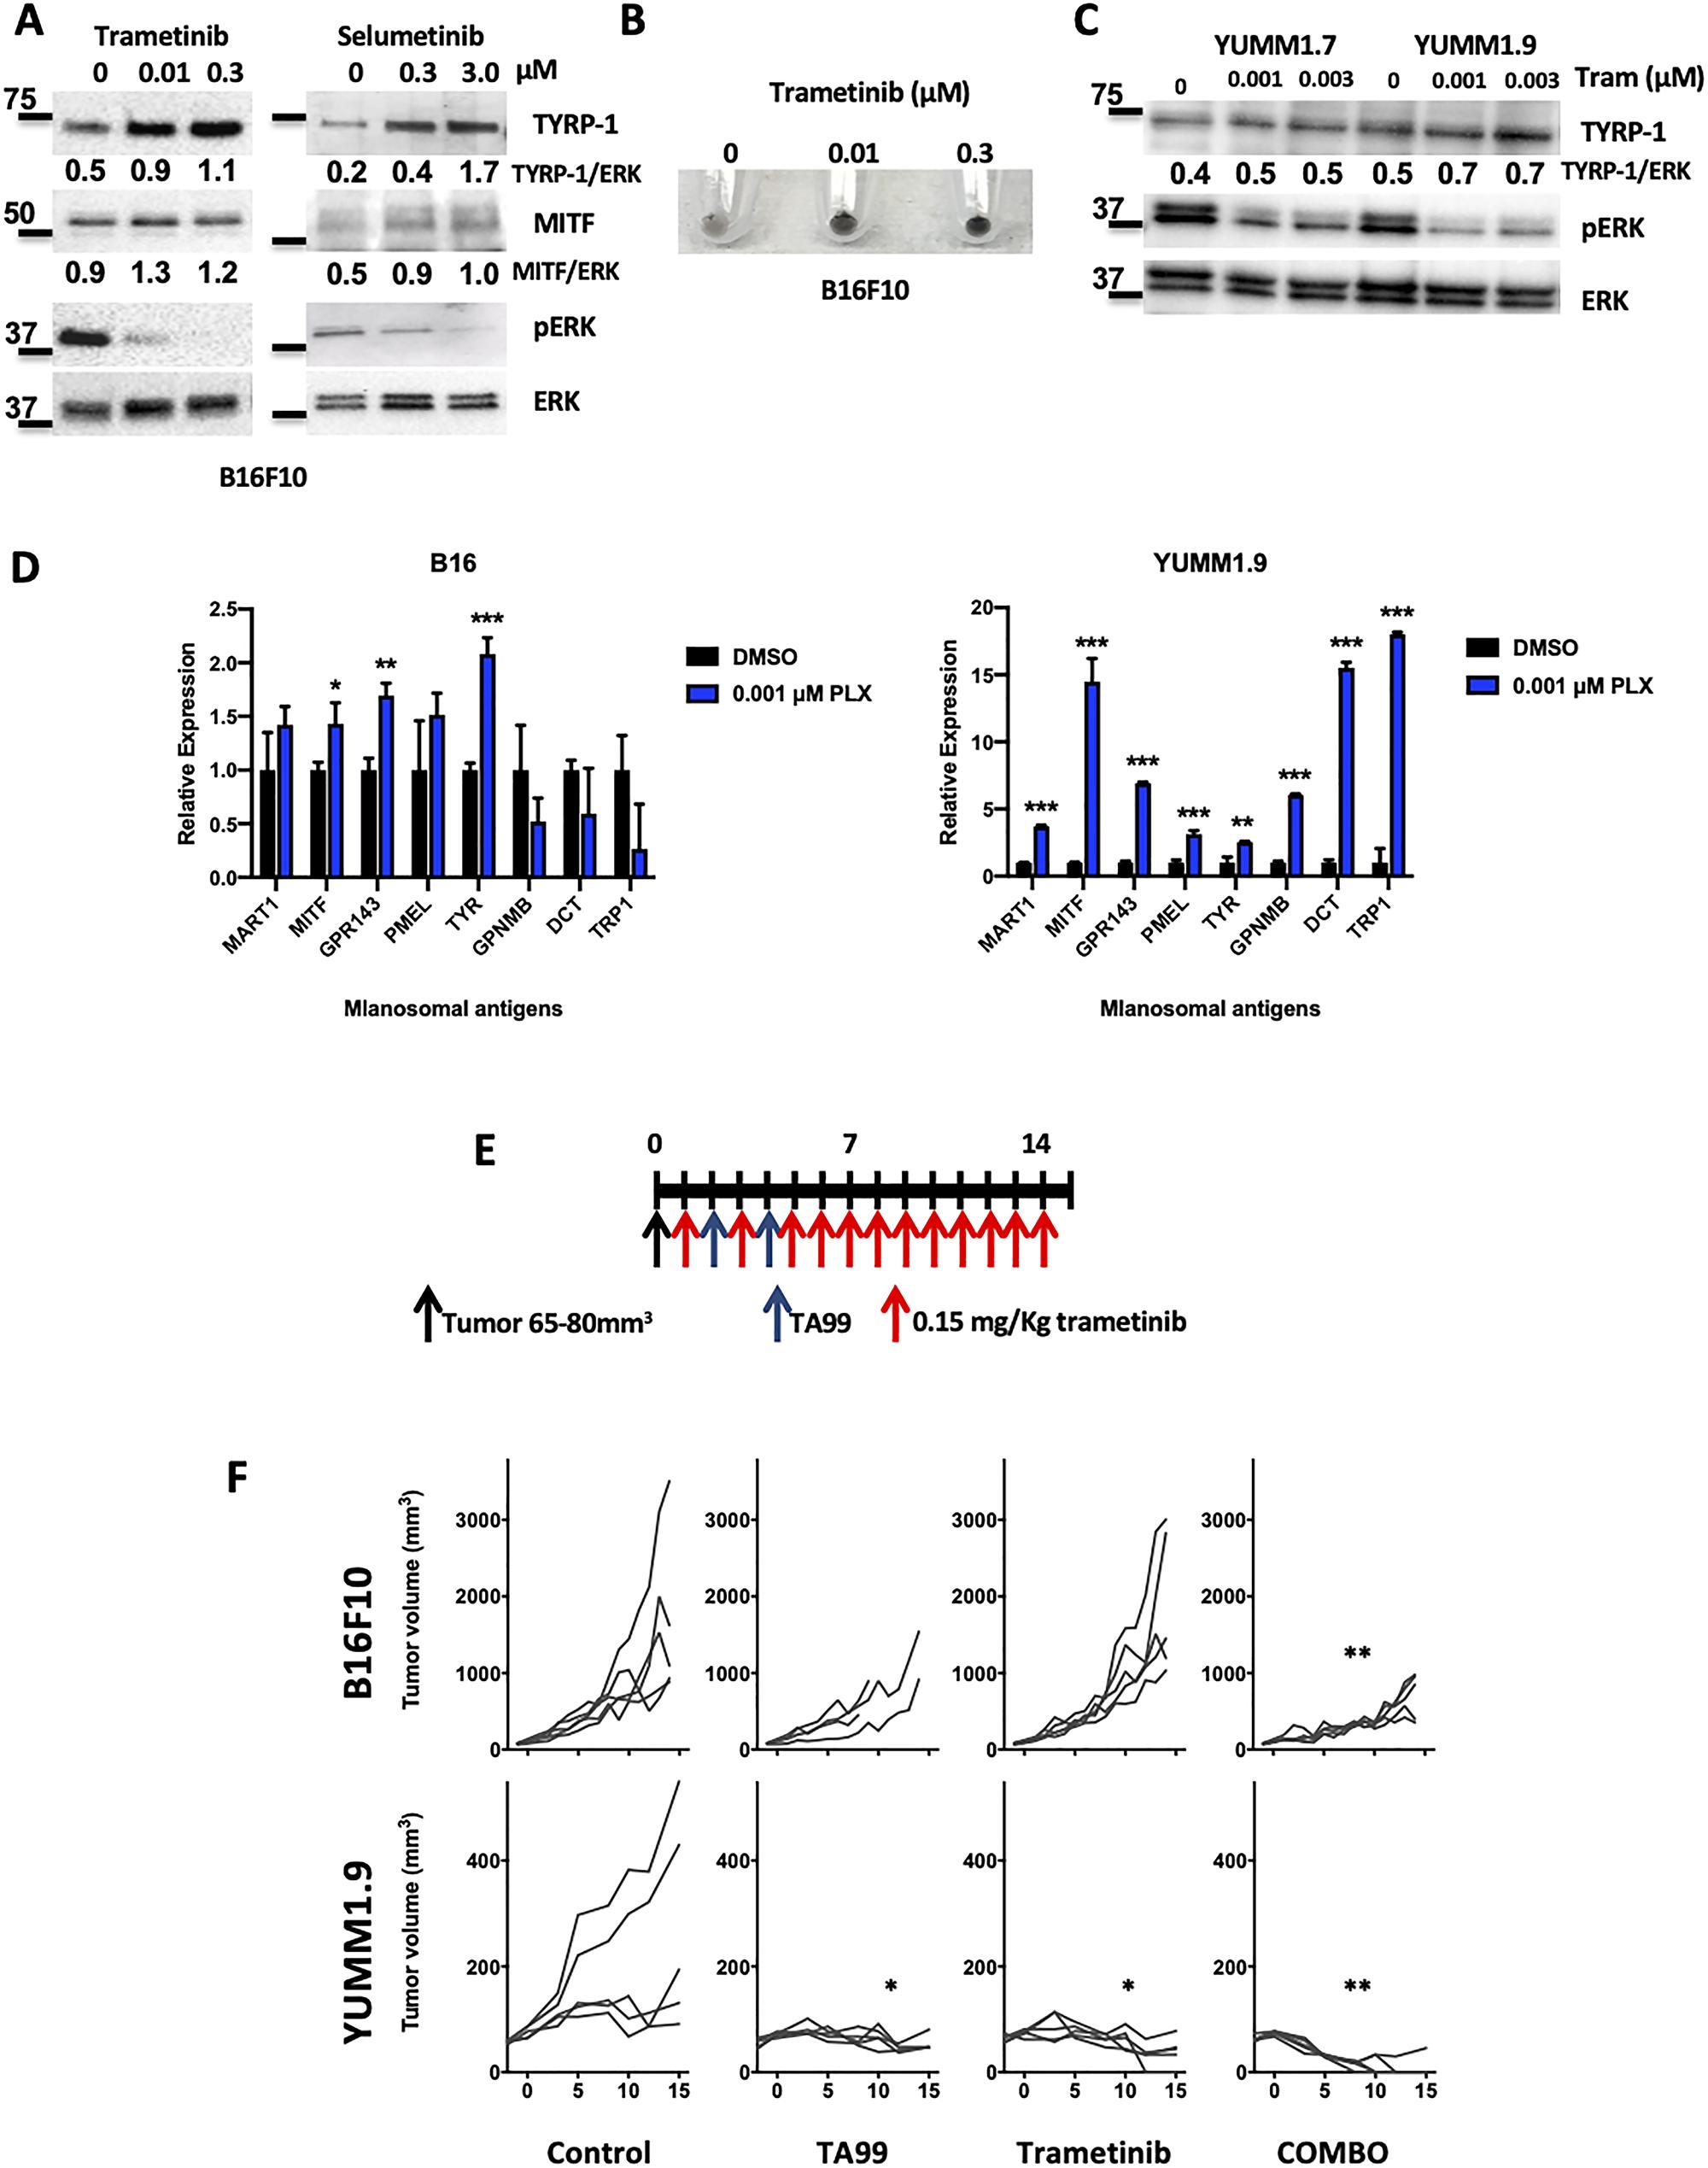 MEK inhibition enhances the anti-tumor effect with TA99 mAb.